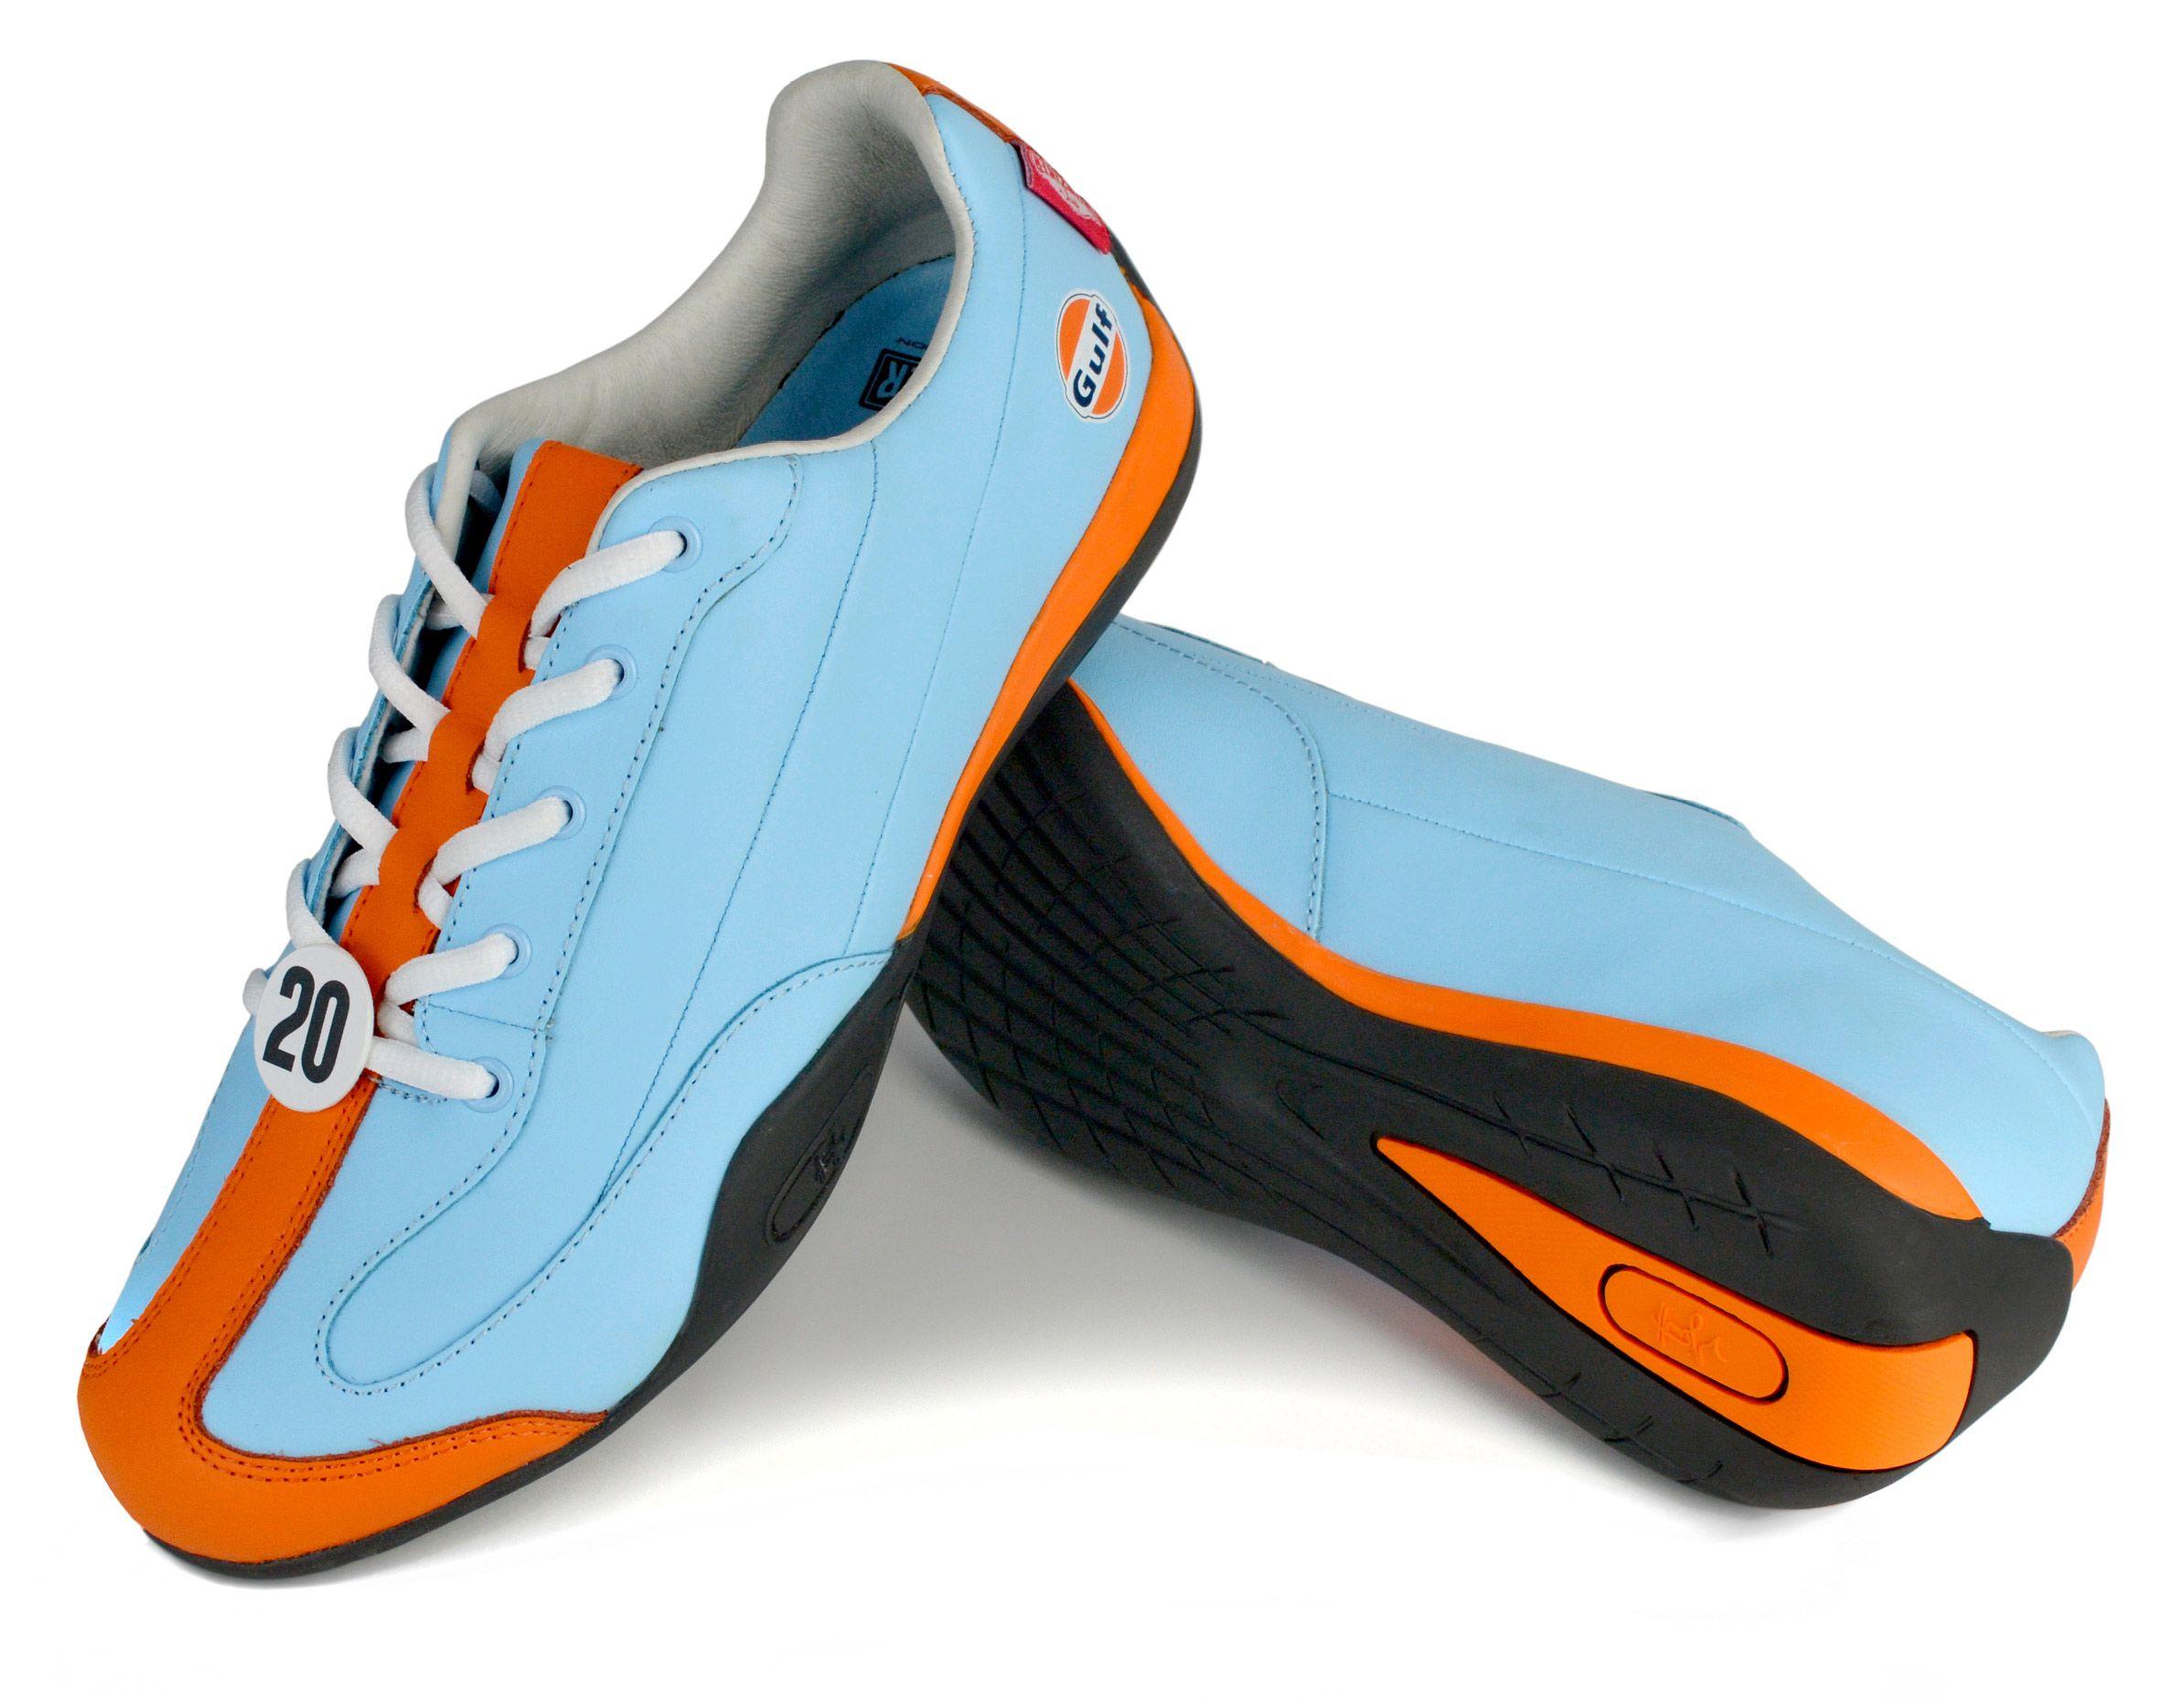 Racing shoes, Gulf racing